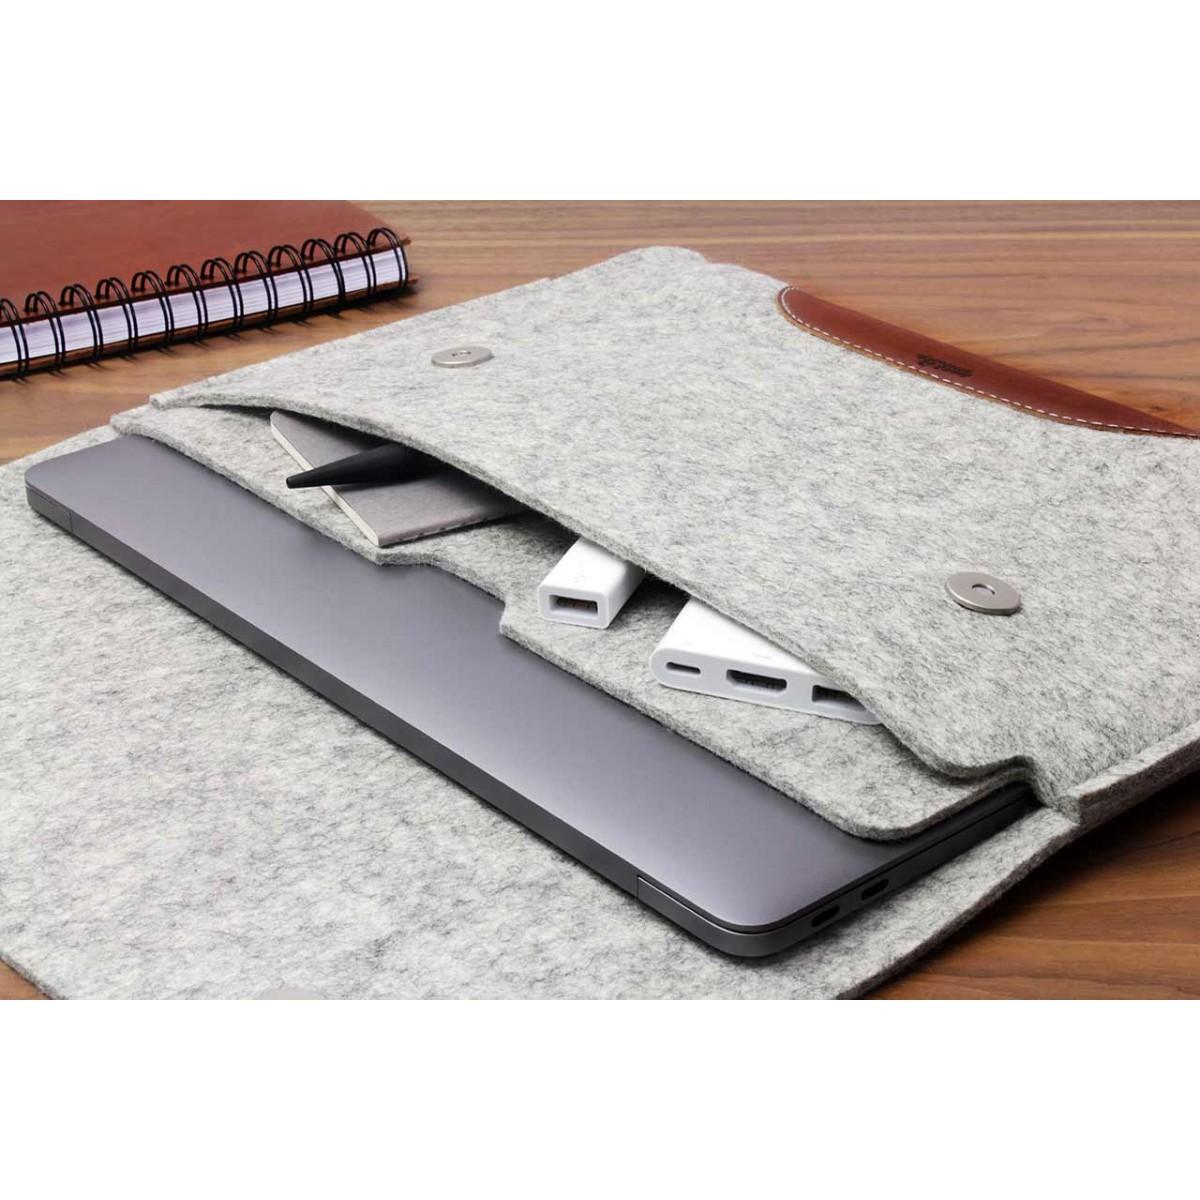 "MacBook Air 13"" (2018) Sleeve Hampshire 100% Merino Wollfilz, Pflanzlich gegerbtes Leder"